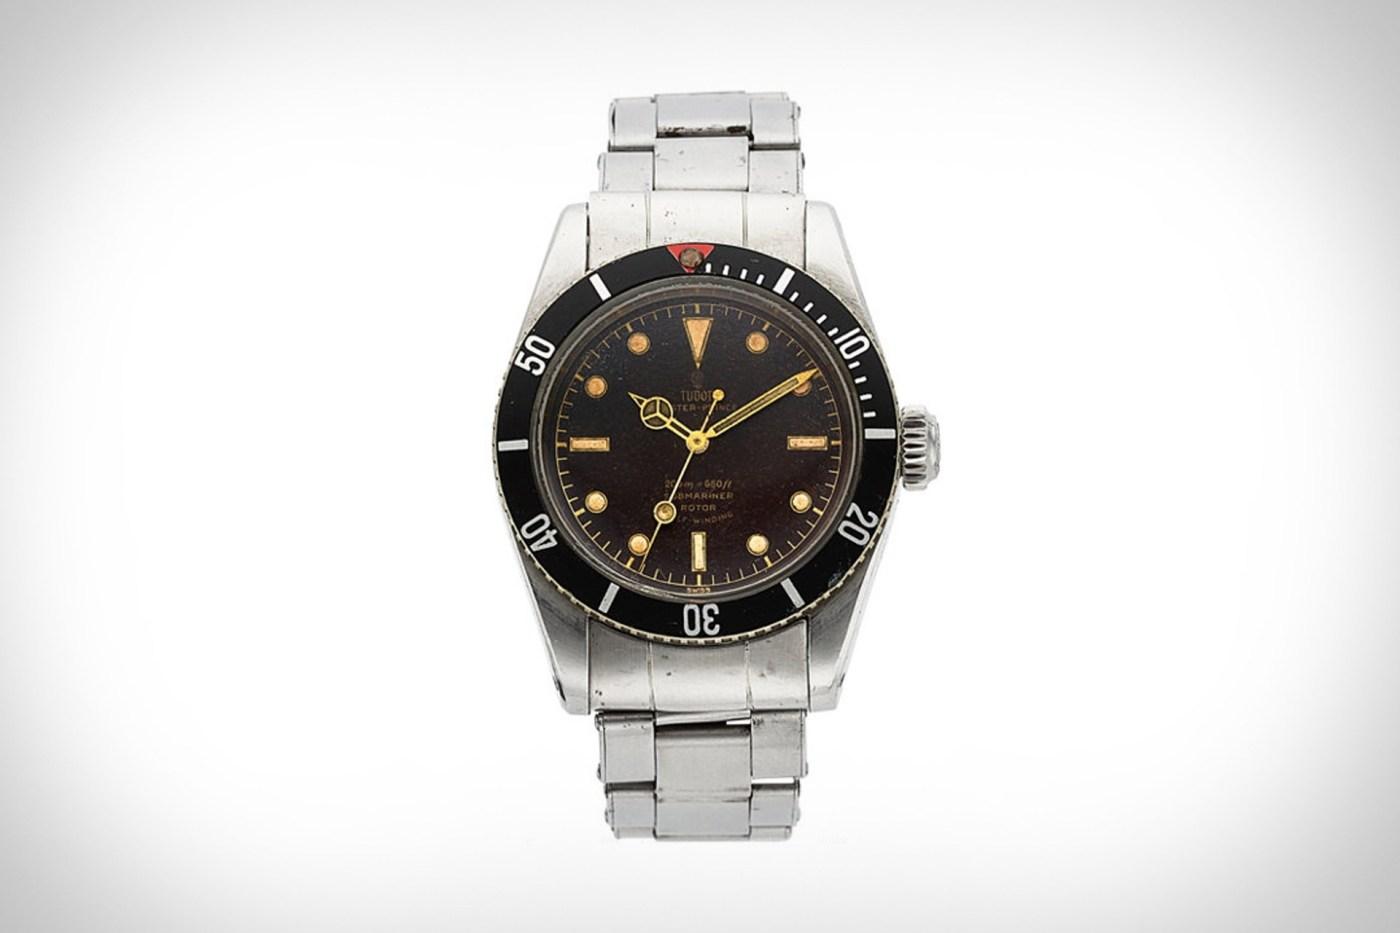 Tudor 7924 Big Crown Submariner Ref. 7924